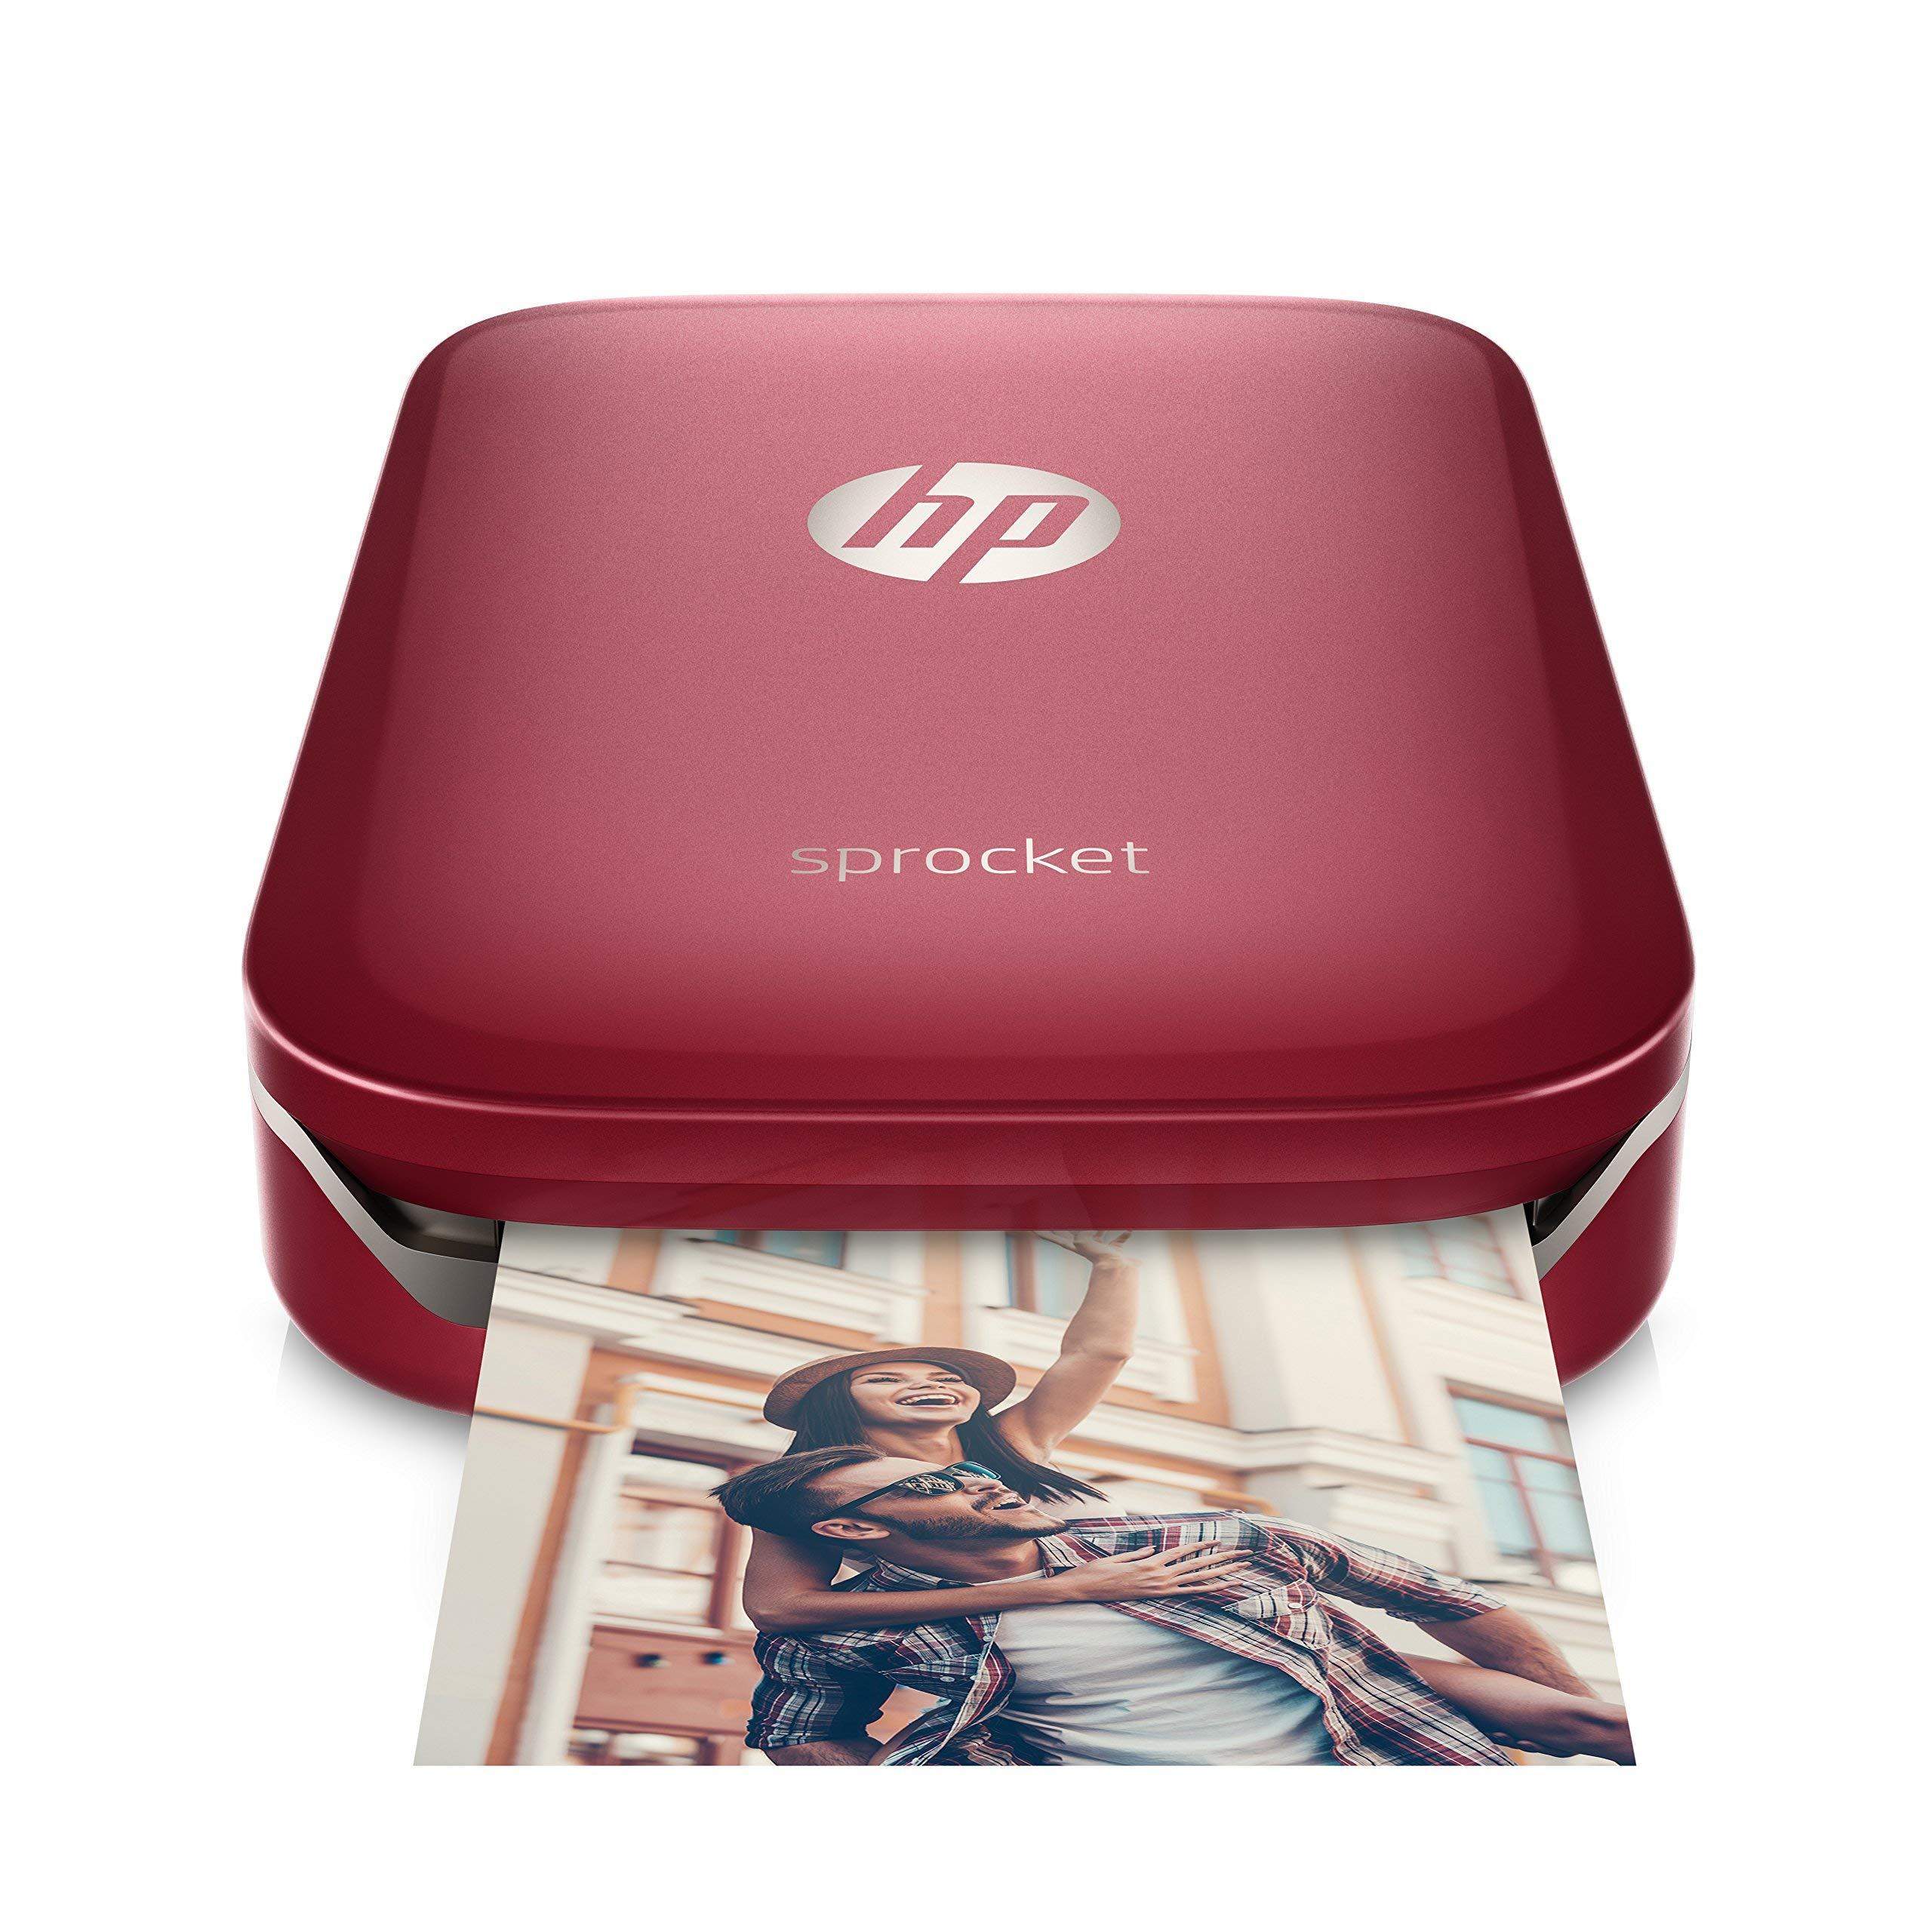 HP Sprocket Portable Photo Printer, Print Social Media Photos on 2x3 Sticky-Backed Paper - Red (Z3Z93A) (Renewed) by HP